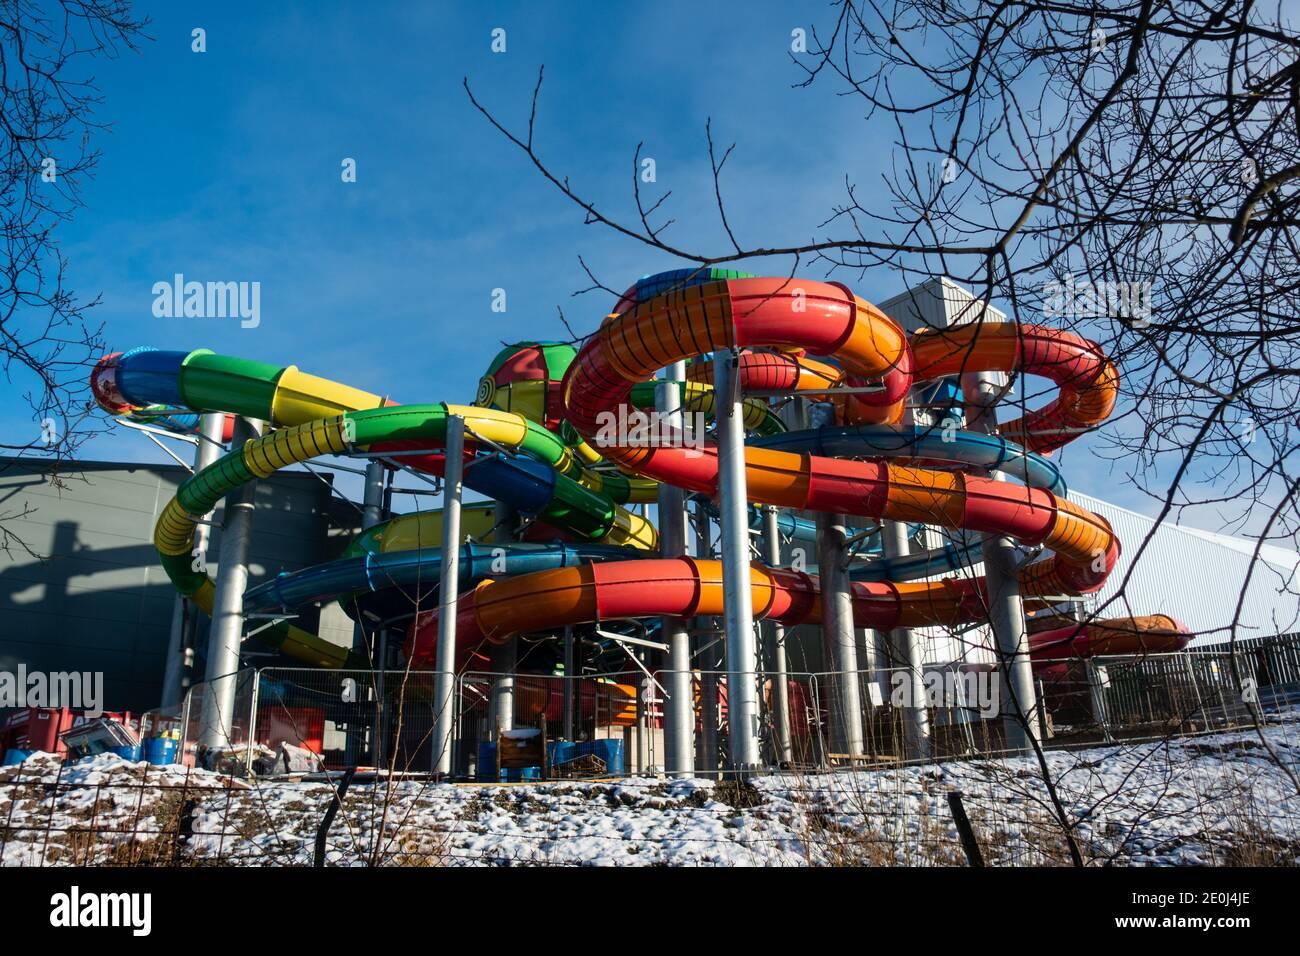 Colourful slide tubes at Waterworld water park, Stoke-on-Trent, UK Stock Photo